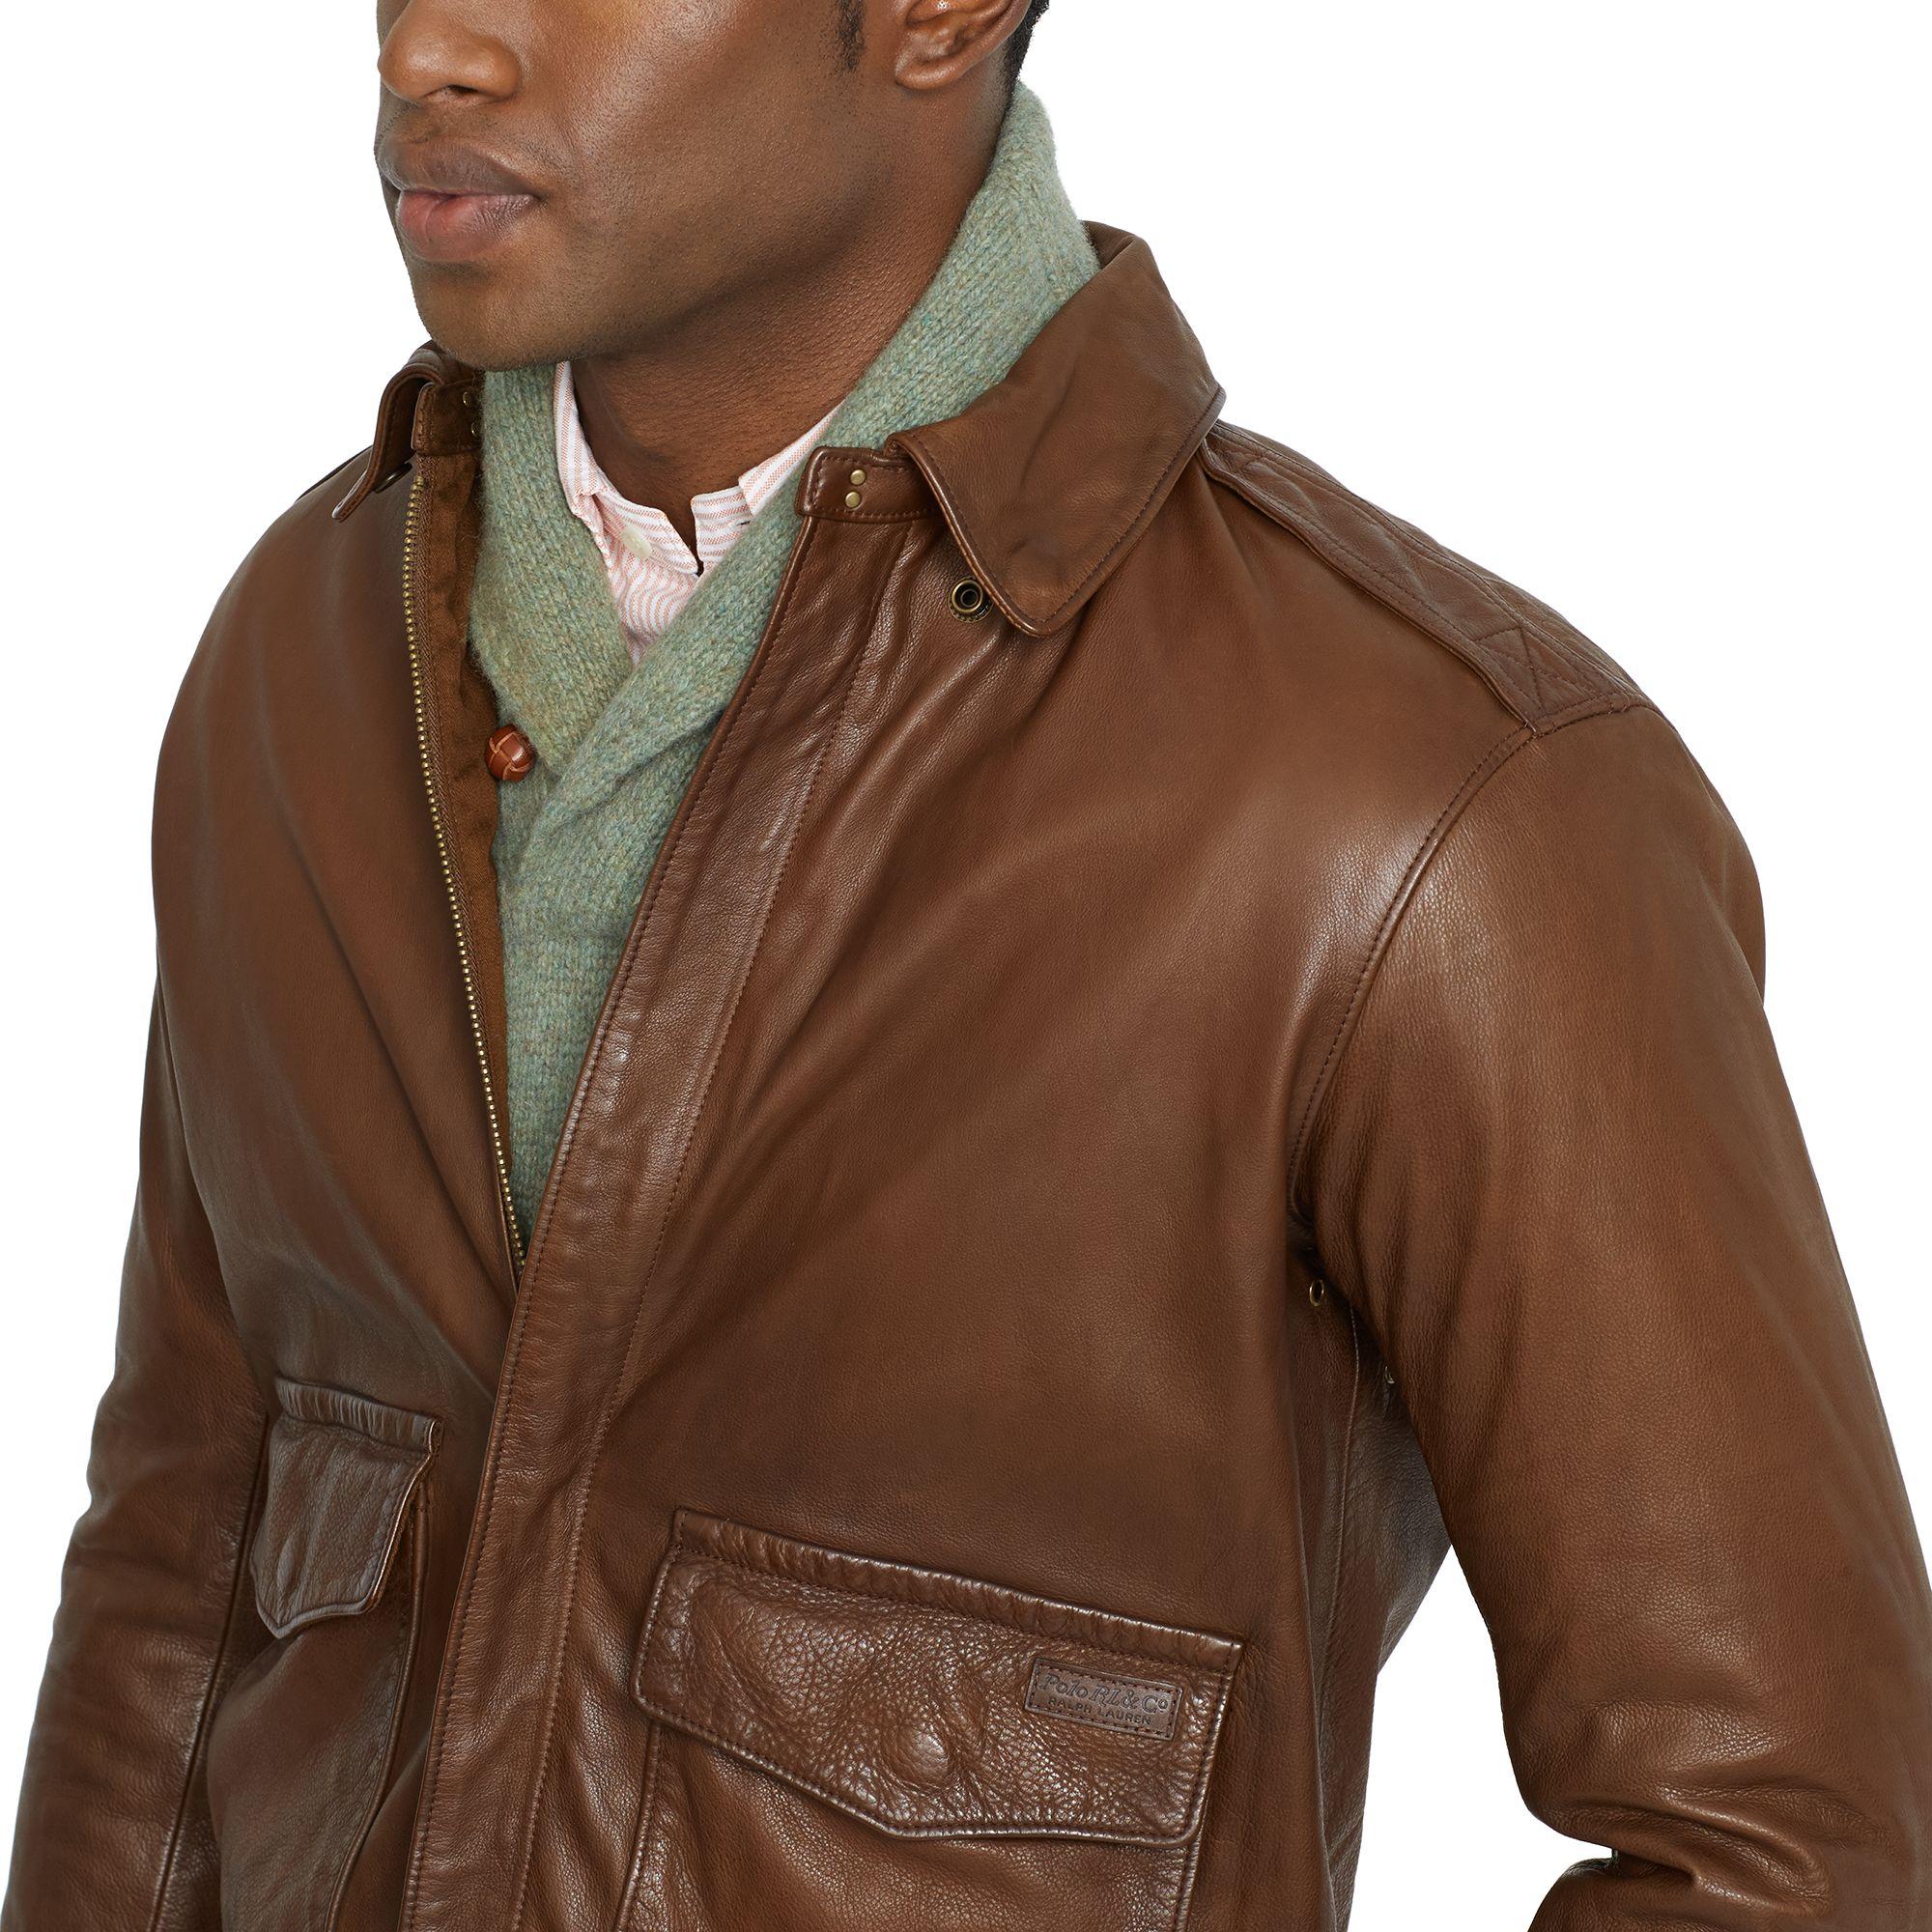 1458d8fb1 Polo Ralph Lauren Leather Farrington A2 Jacket in Black for Men - Lyst